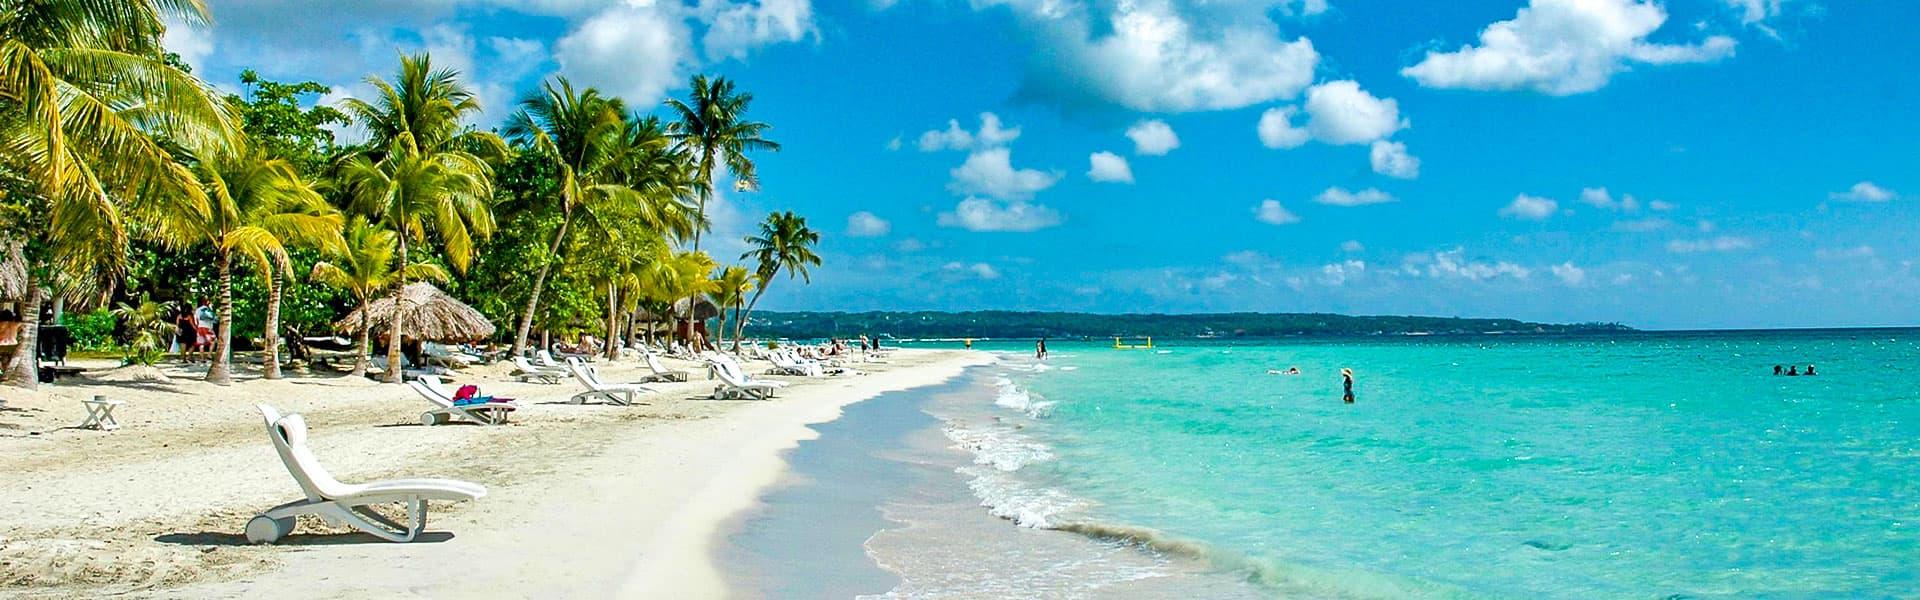 7-mile Beach, Jamaica